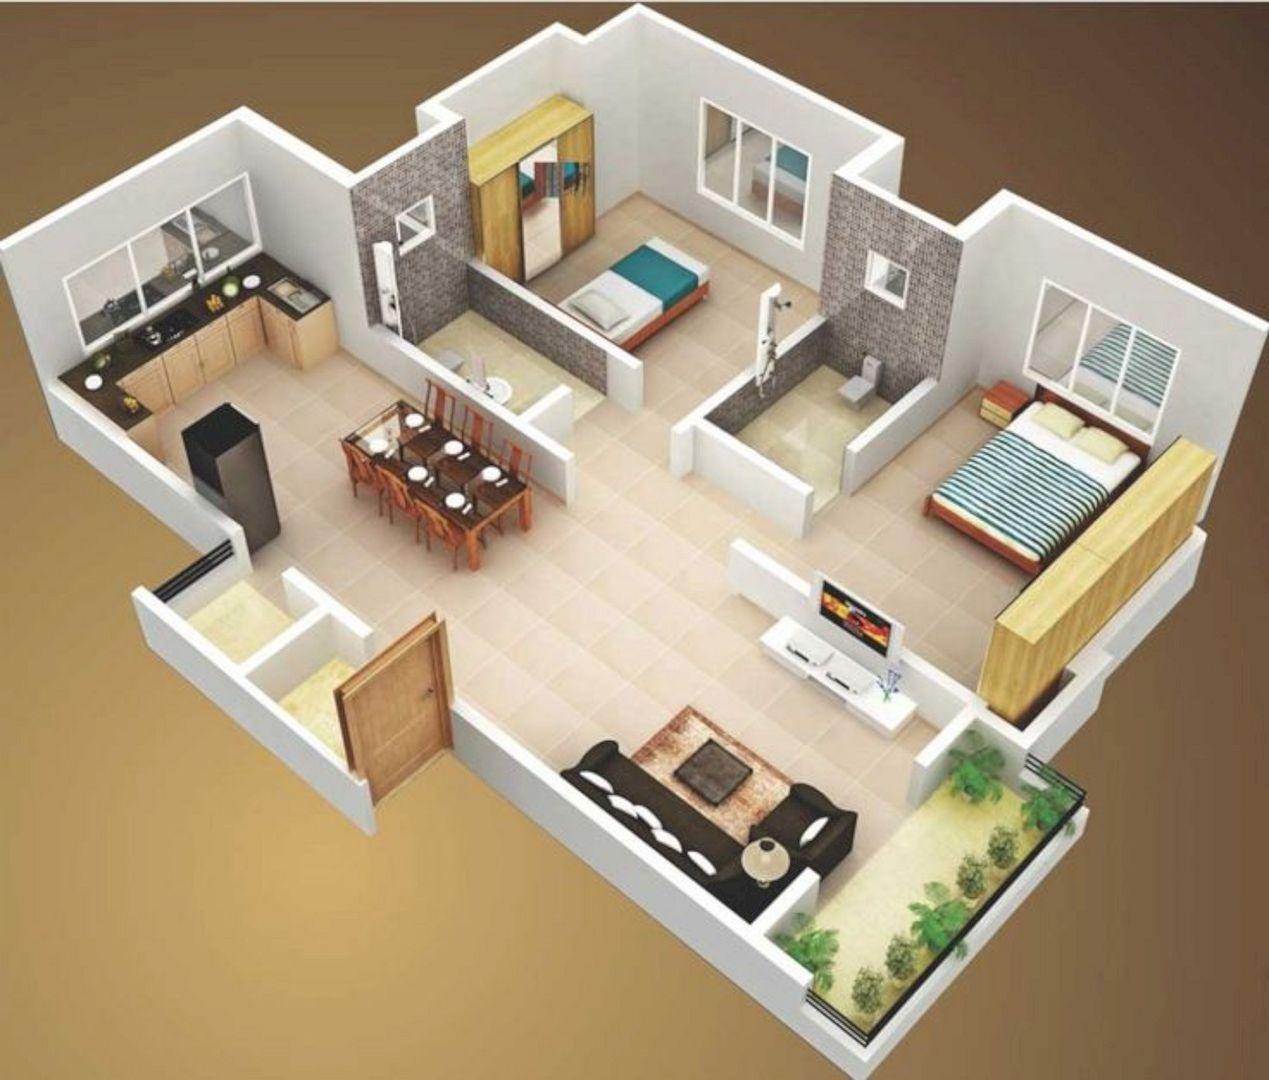 Sims house plans bungalow also floor plan  bedroom homeinteriordecorationfloorplans diy in rh pinterest